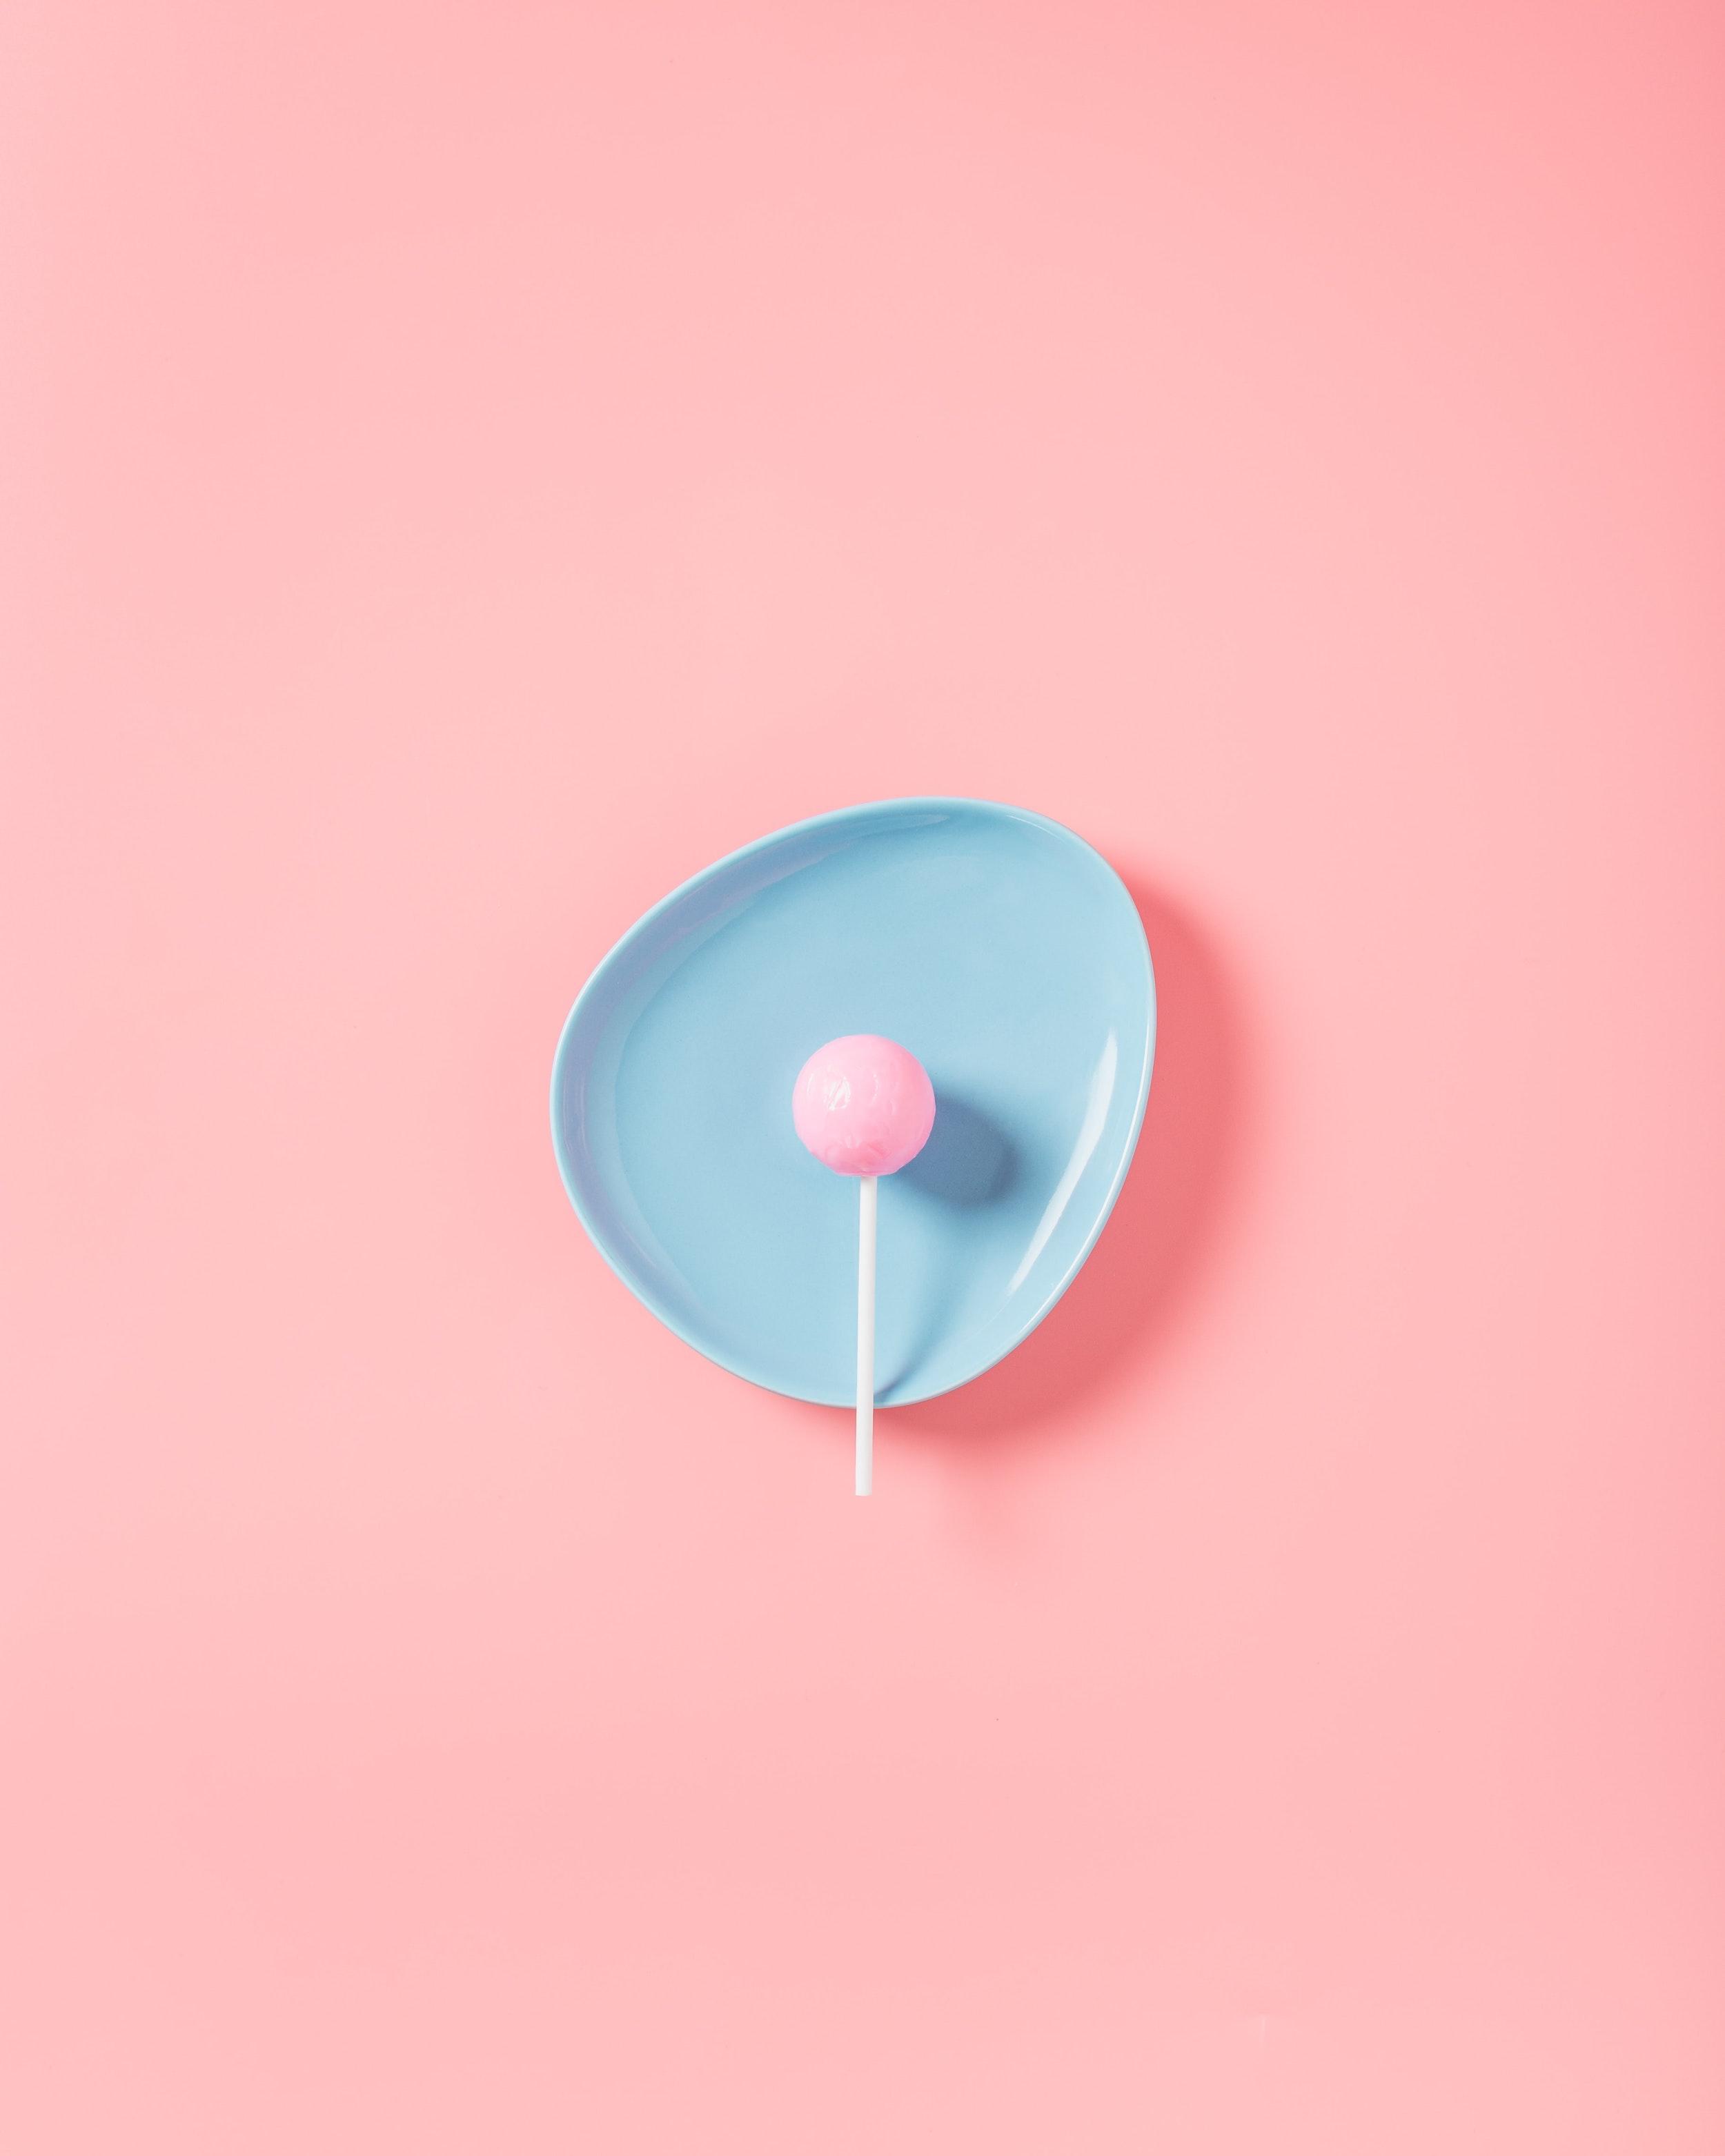 pink lollipop dam company asset